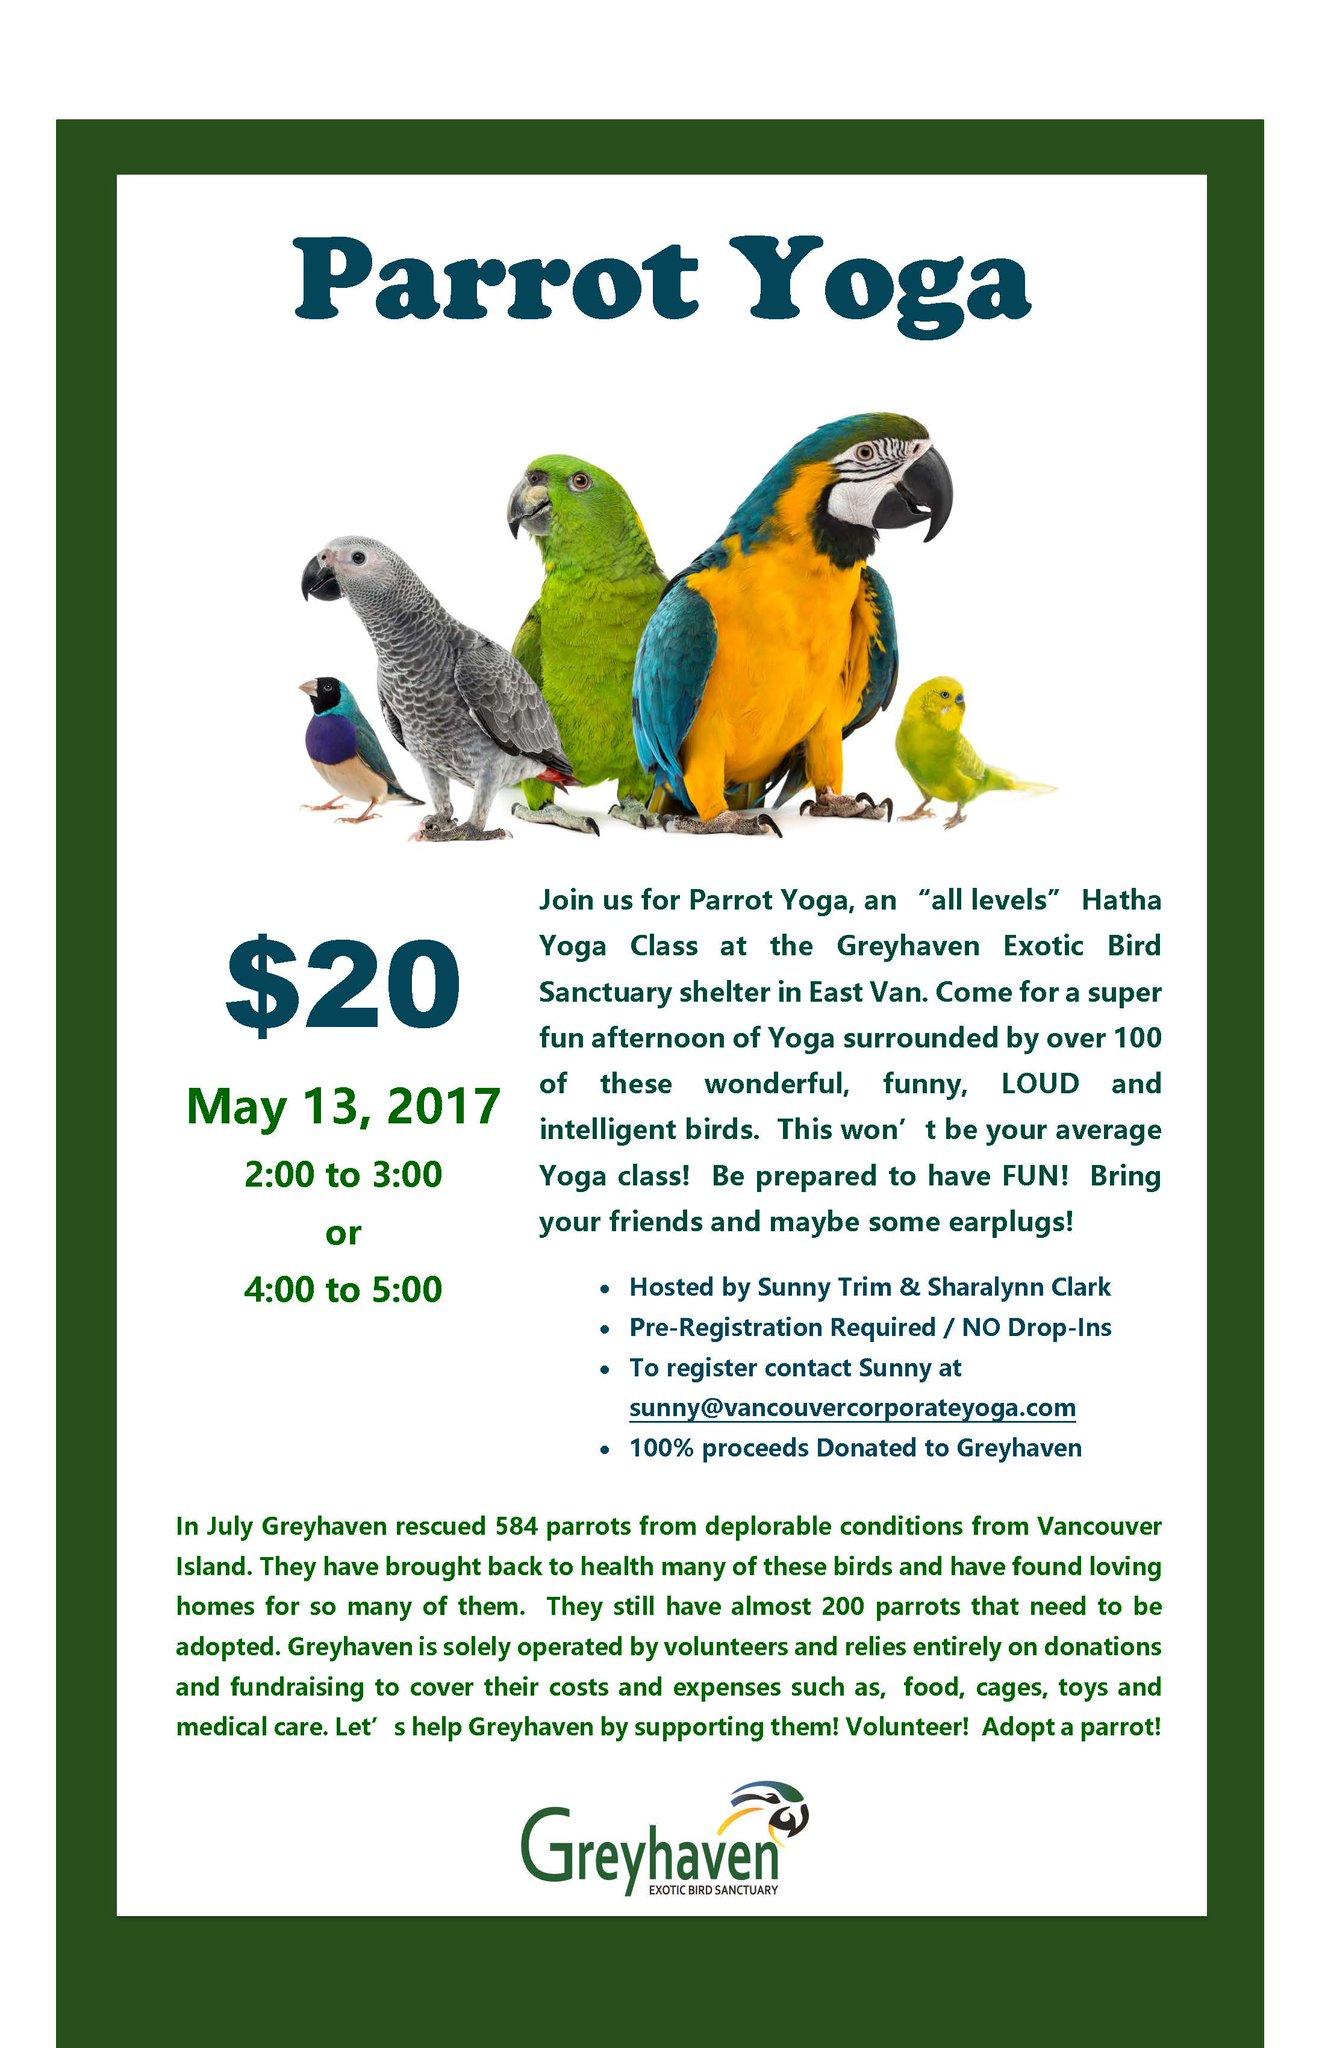 Greyhaven Birds on Twitter: